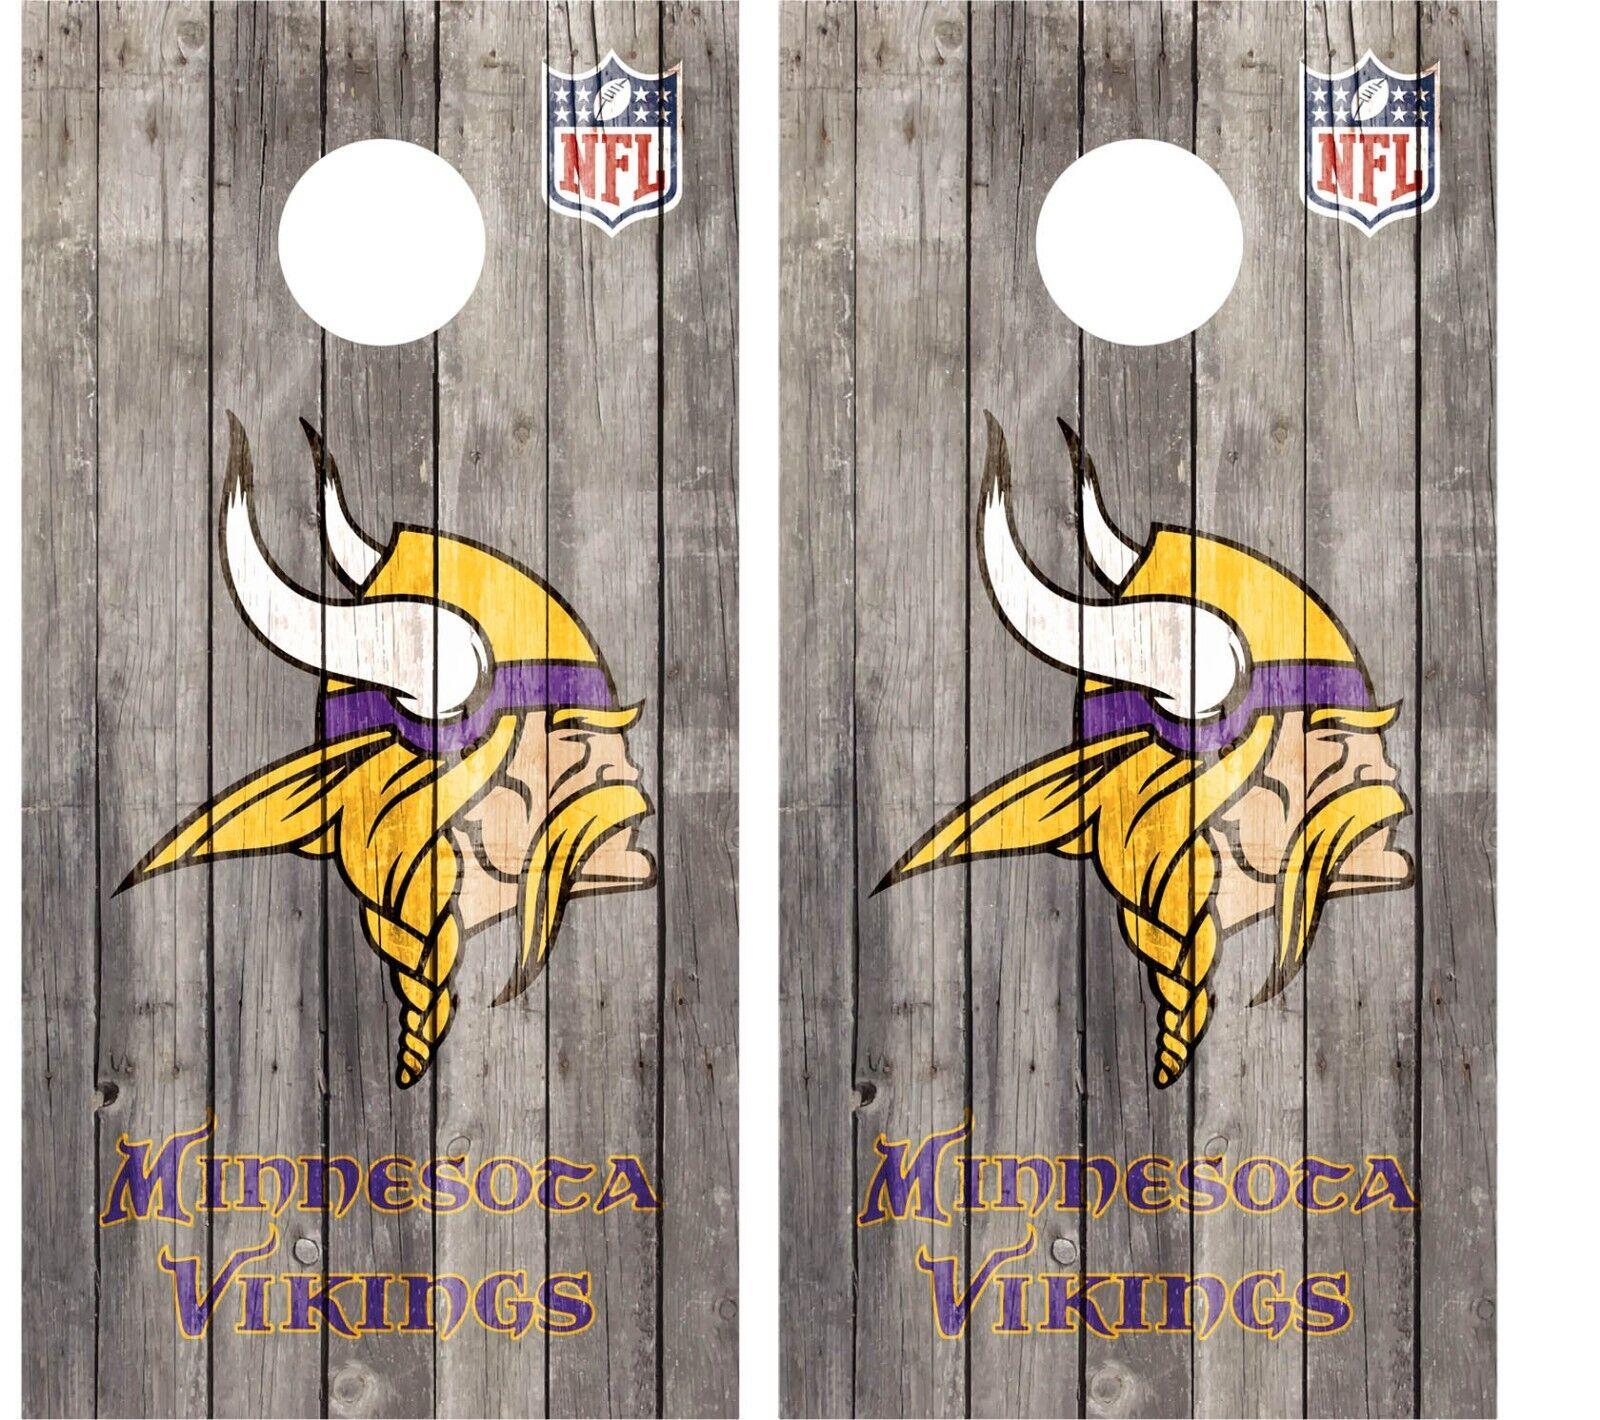 Pair of Minnesota Vikings NFL Wood Cornhole Board Vinyl  Decal Wrap Wraps  ultra-low prices